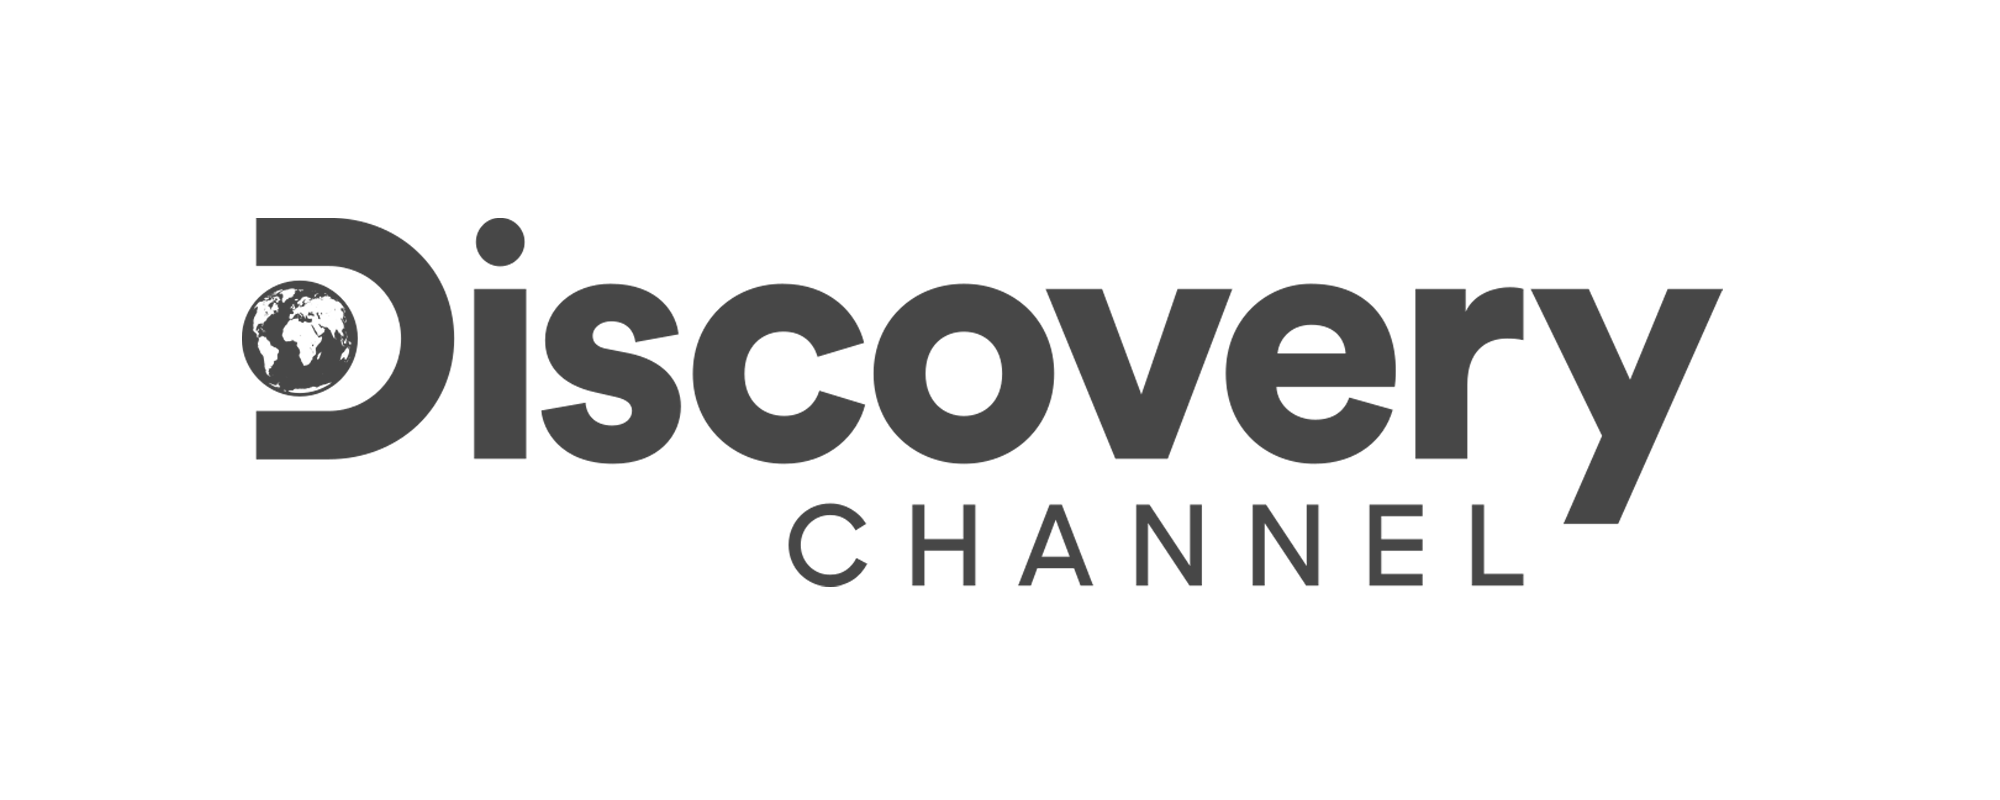 https://www.shirtstore.se/pub_docs/files/Mer/Logoline_Discovery_20x8.png